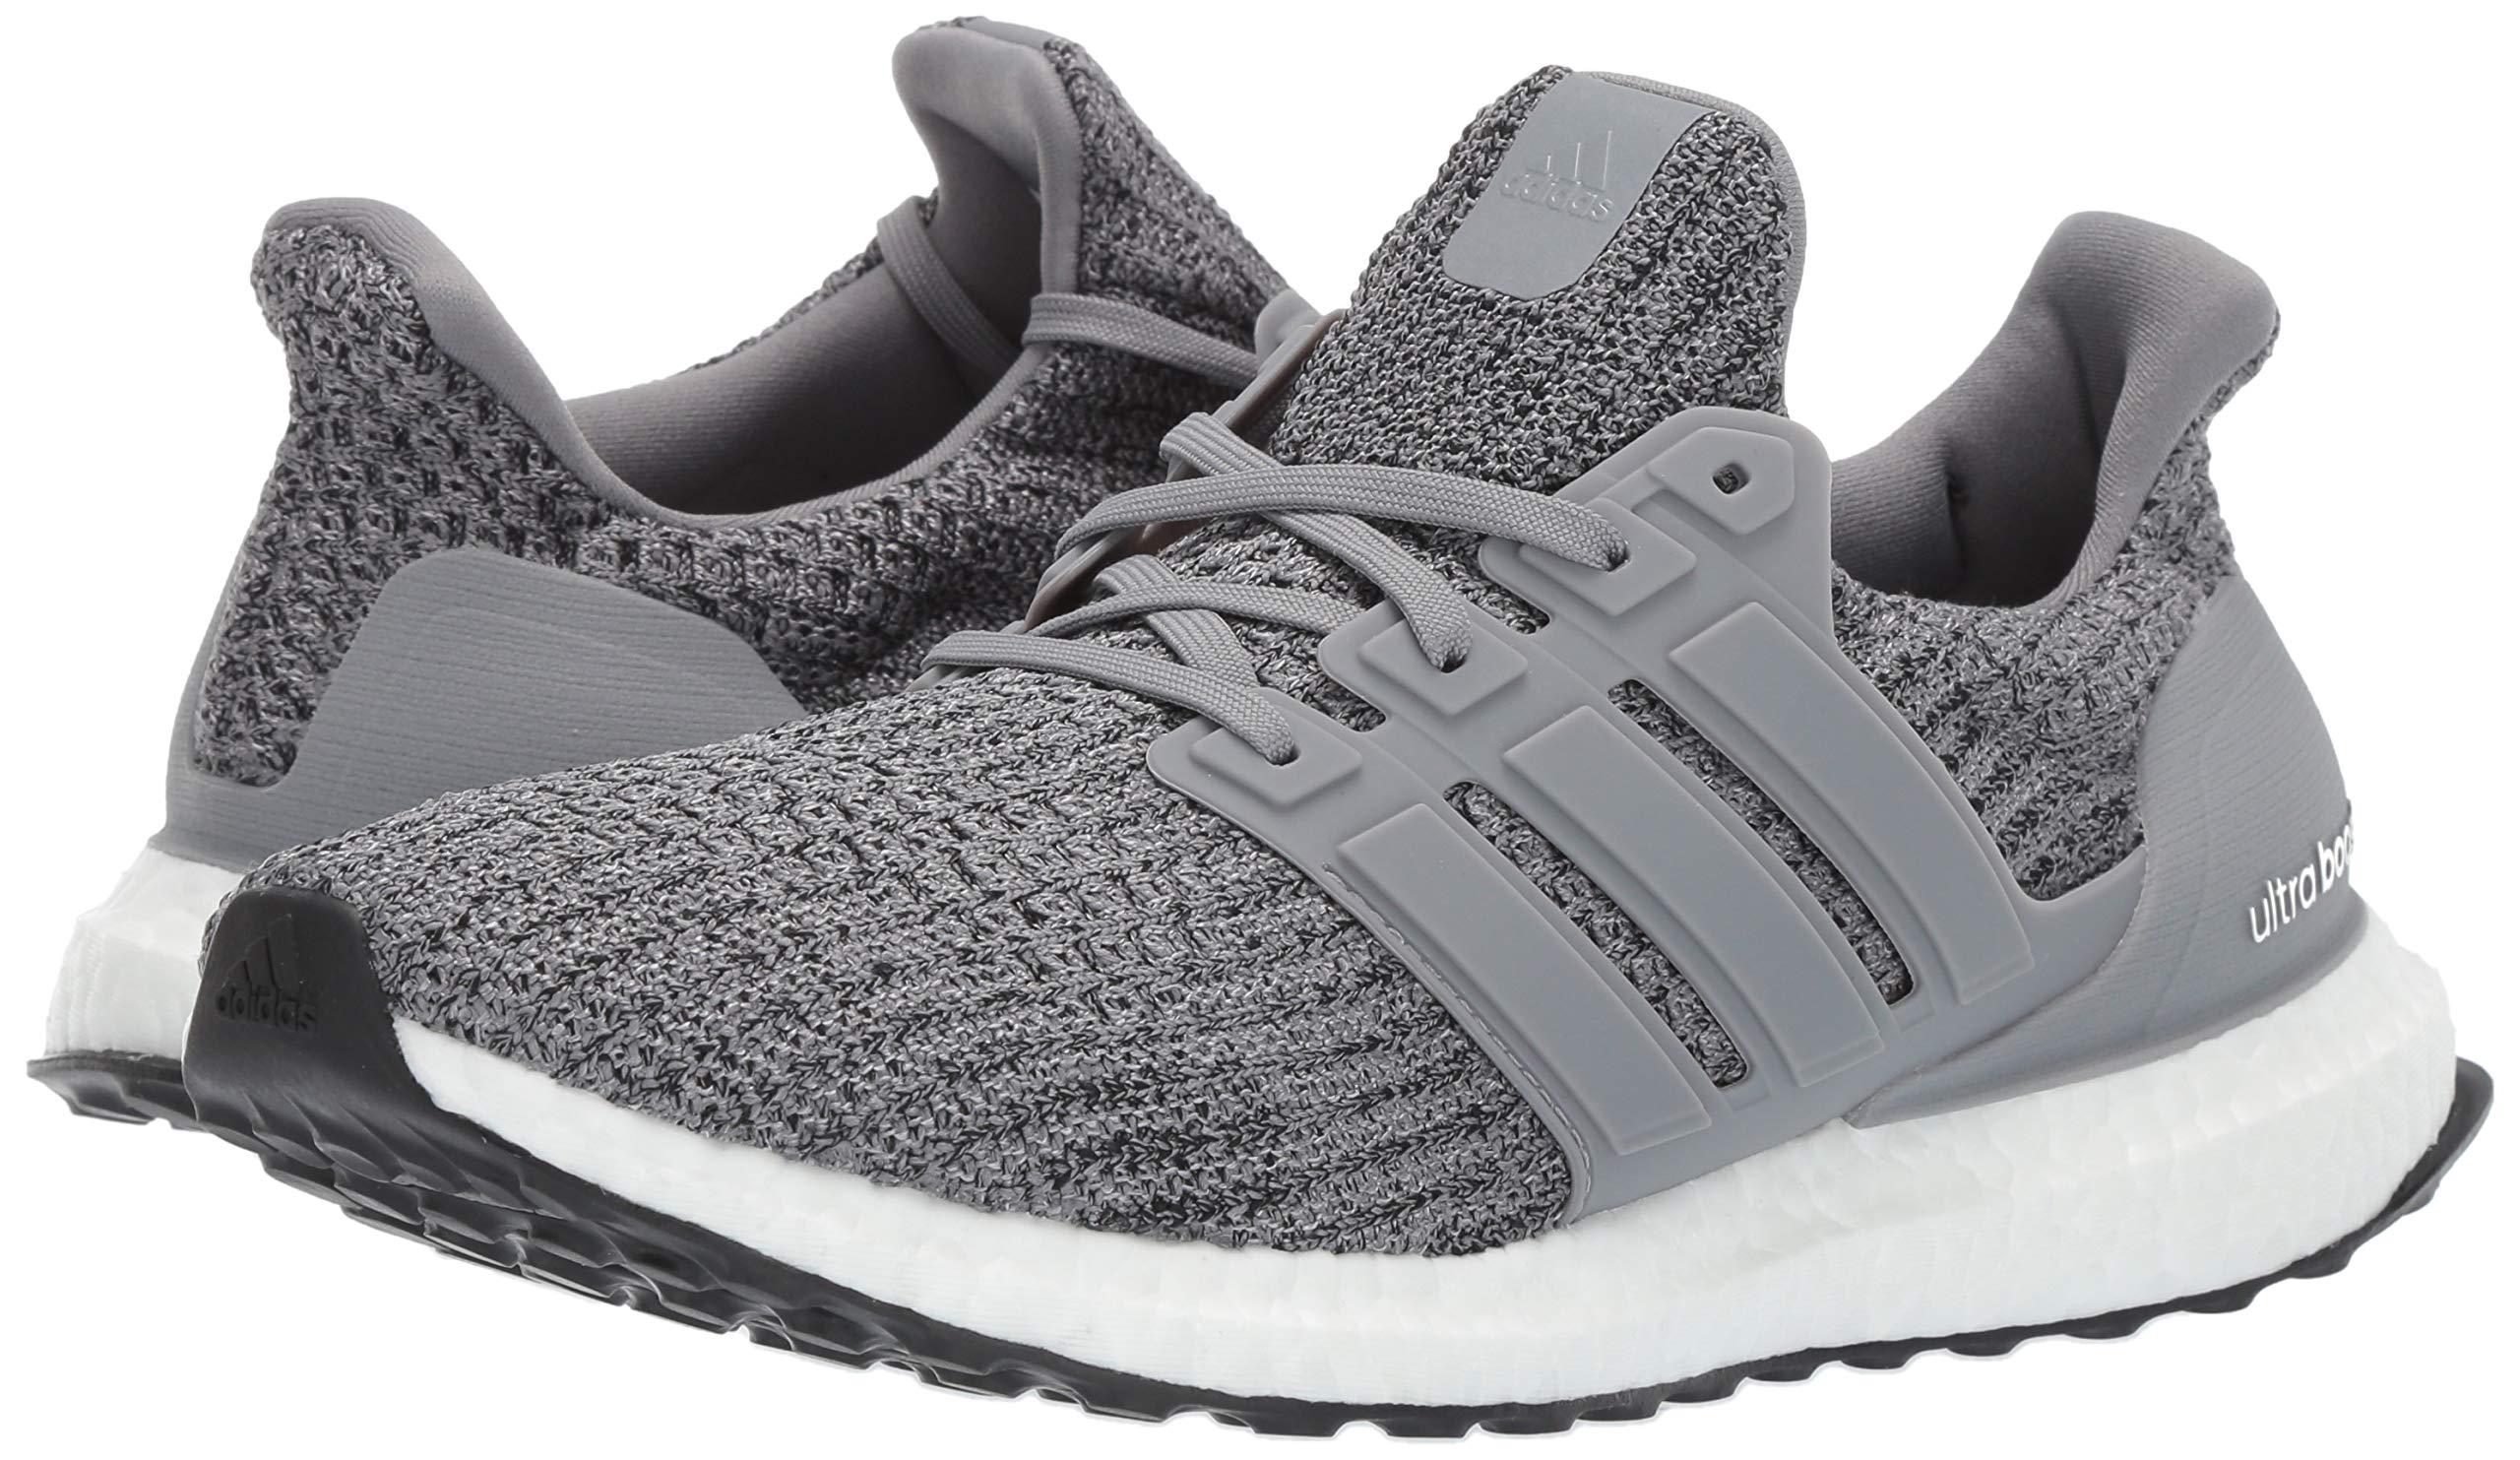 adidas Men's Ultraboost, Grey/Black, 4 M US by adidas (Image #6)